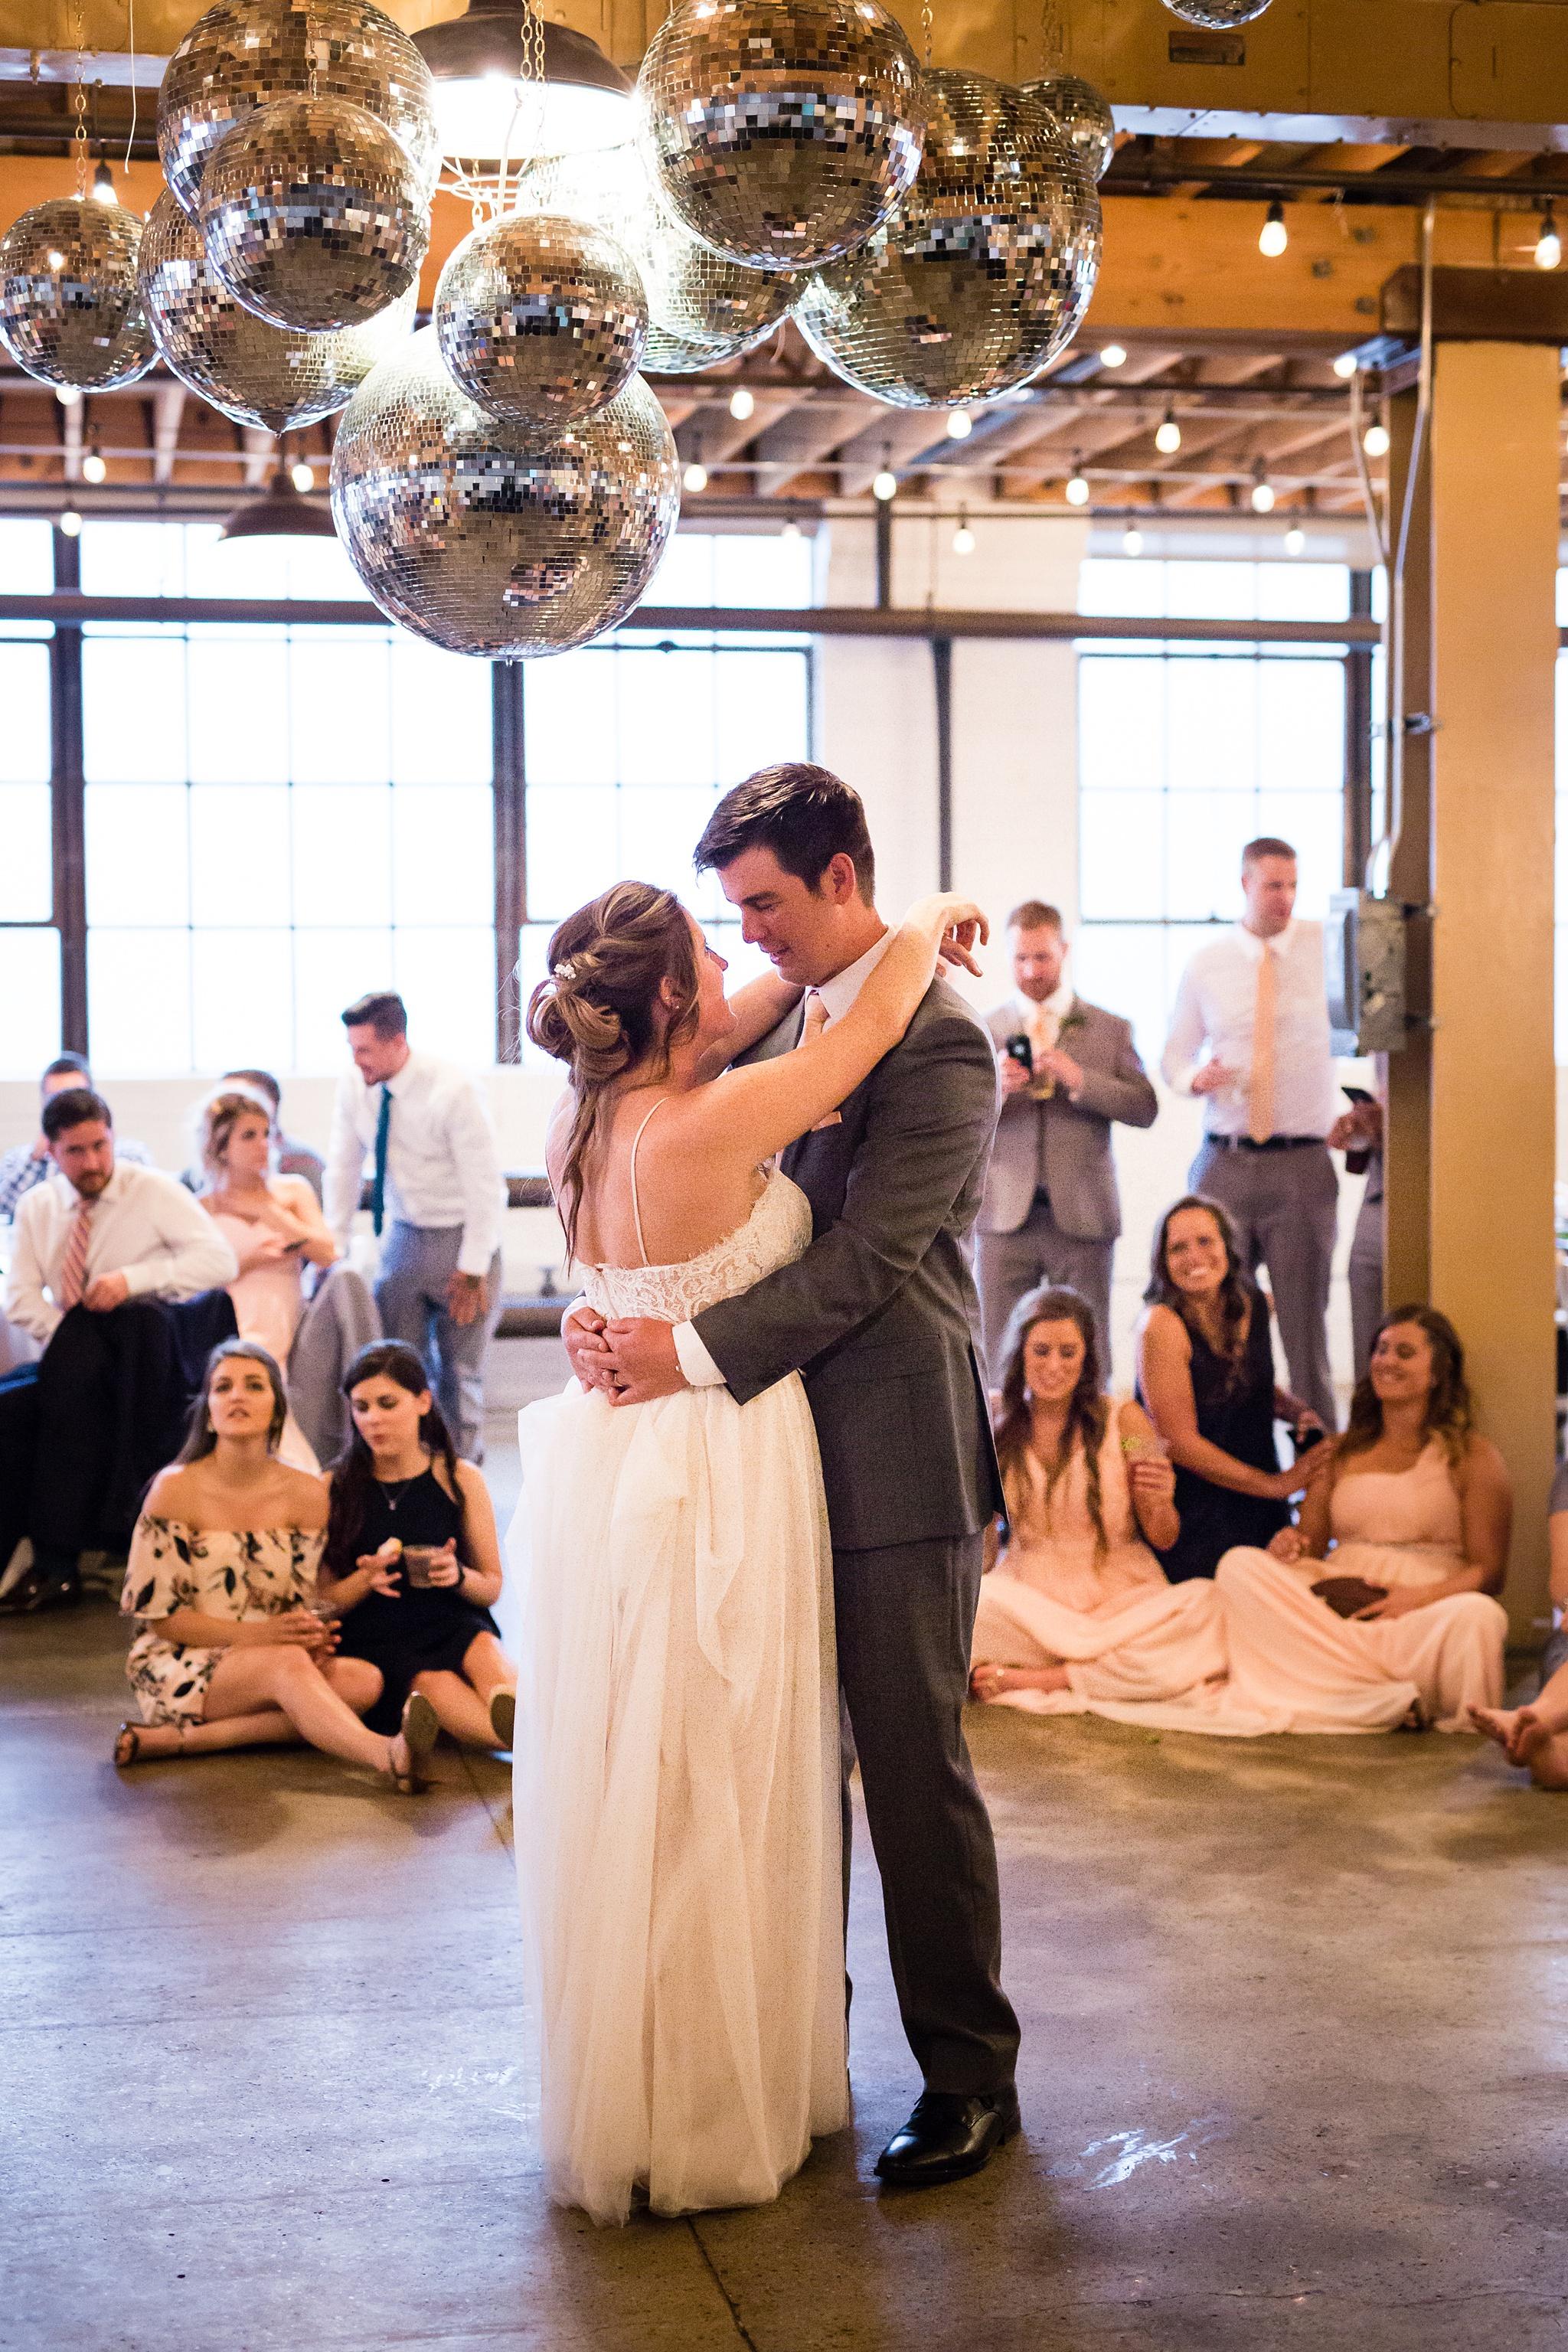 Meghan_Drew_Grand_Rapids_Cheney_place_Wedding086.JPG